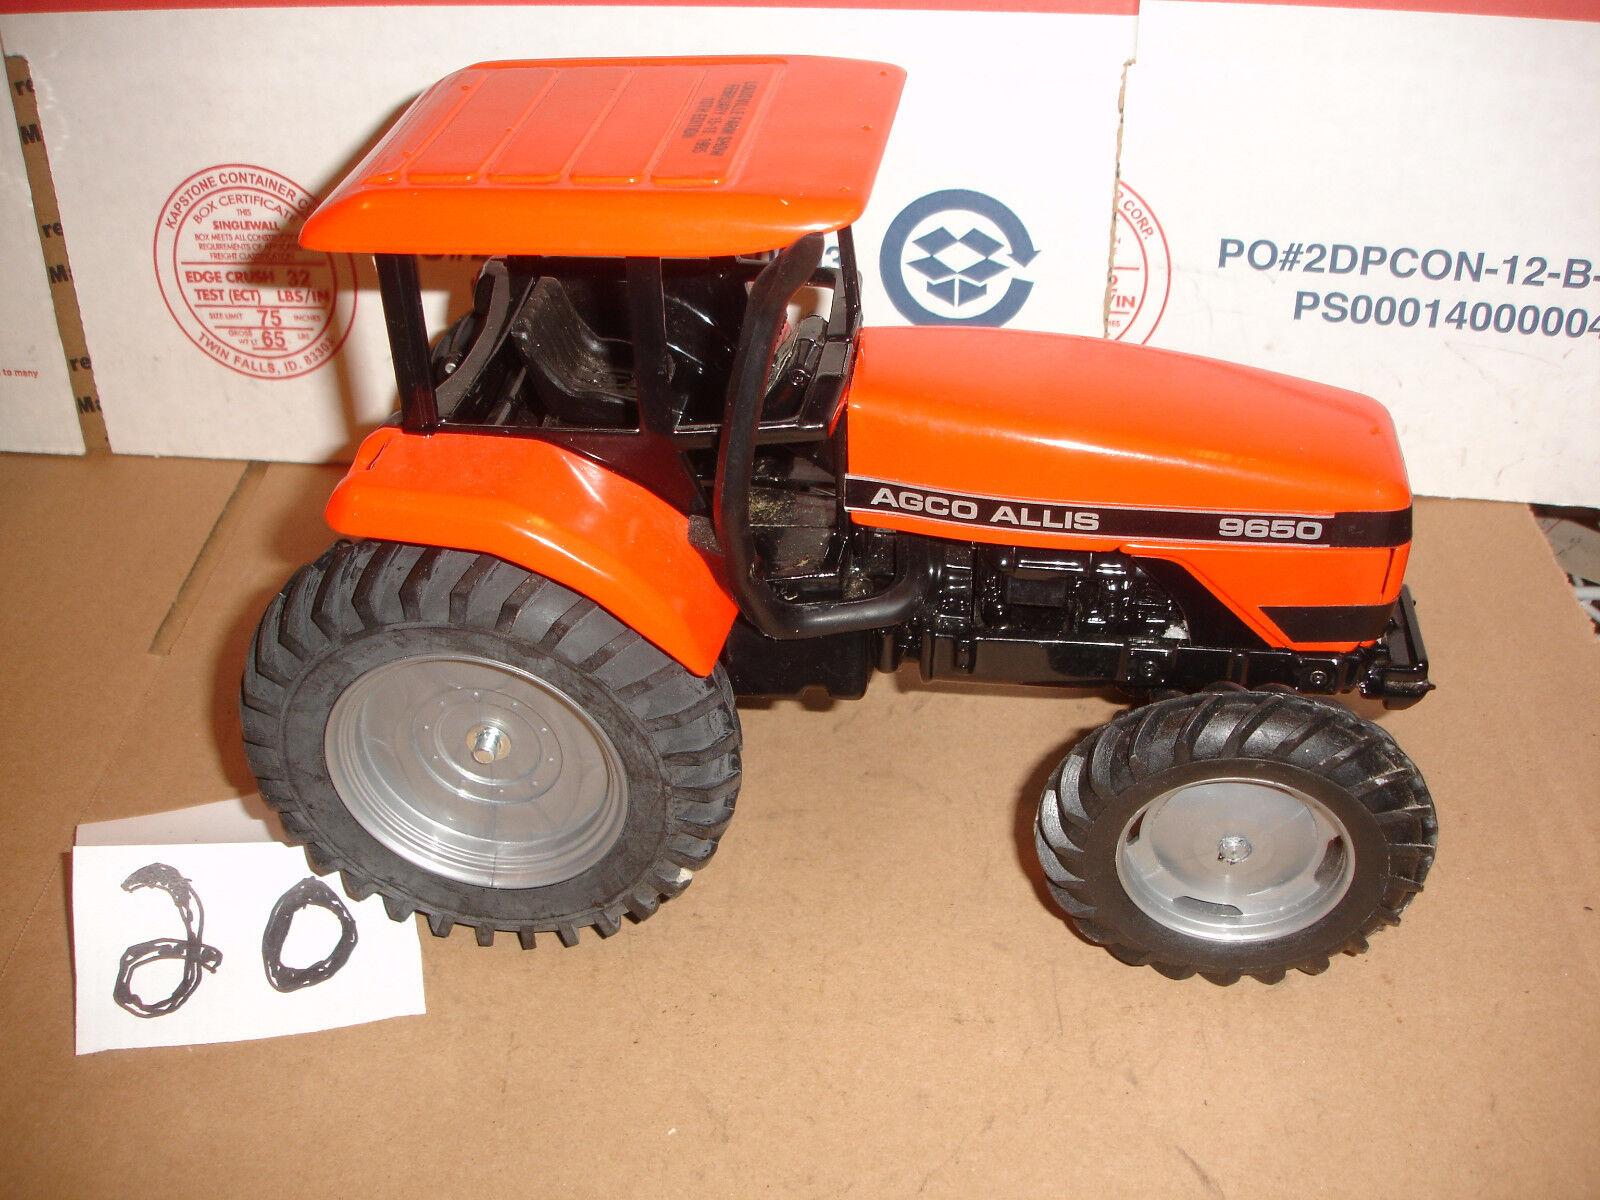 1/16 Agco Allis 9650 Tractor de Louisville mostrar Toy